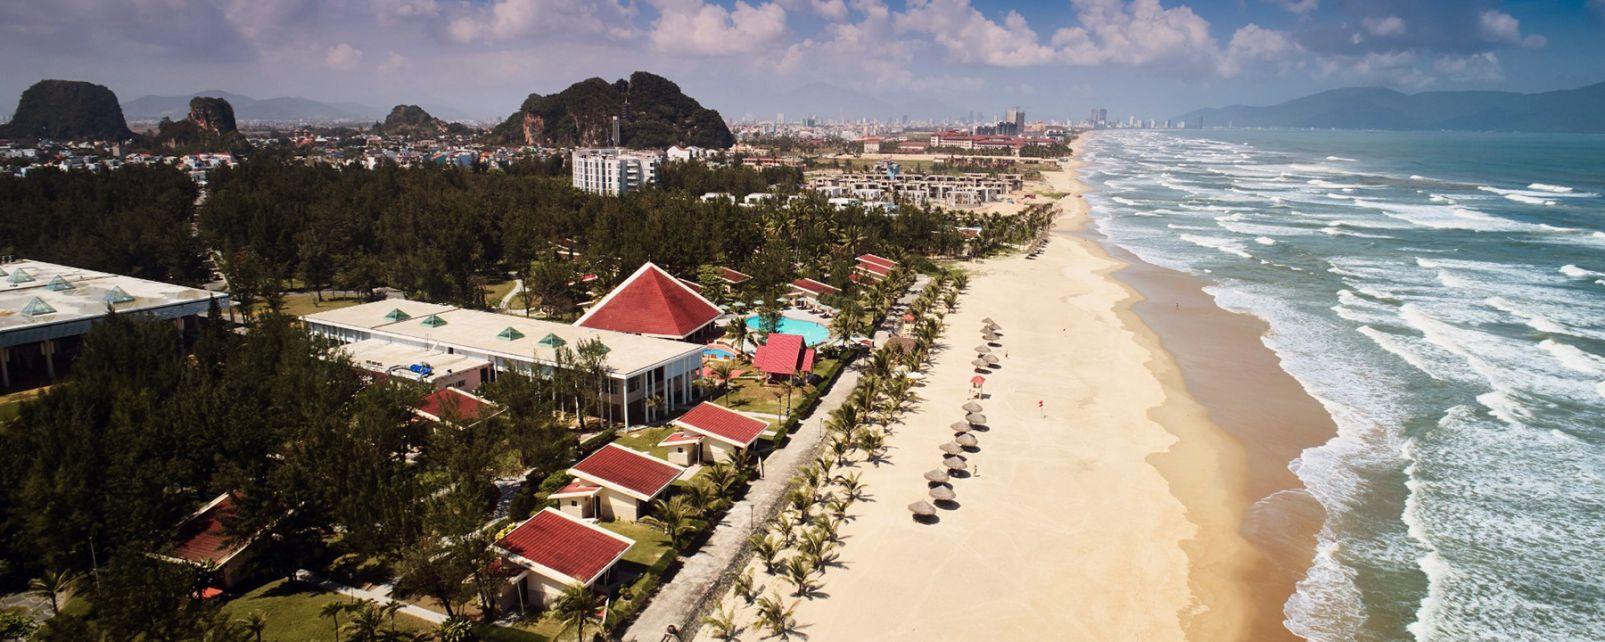 Hôtel Centara Sandy Beach Resort Danang 4